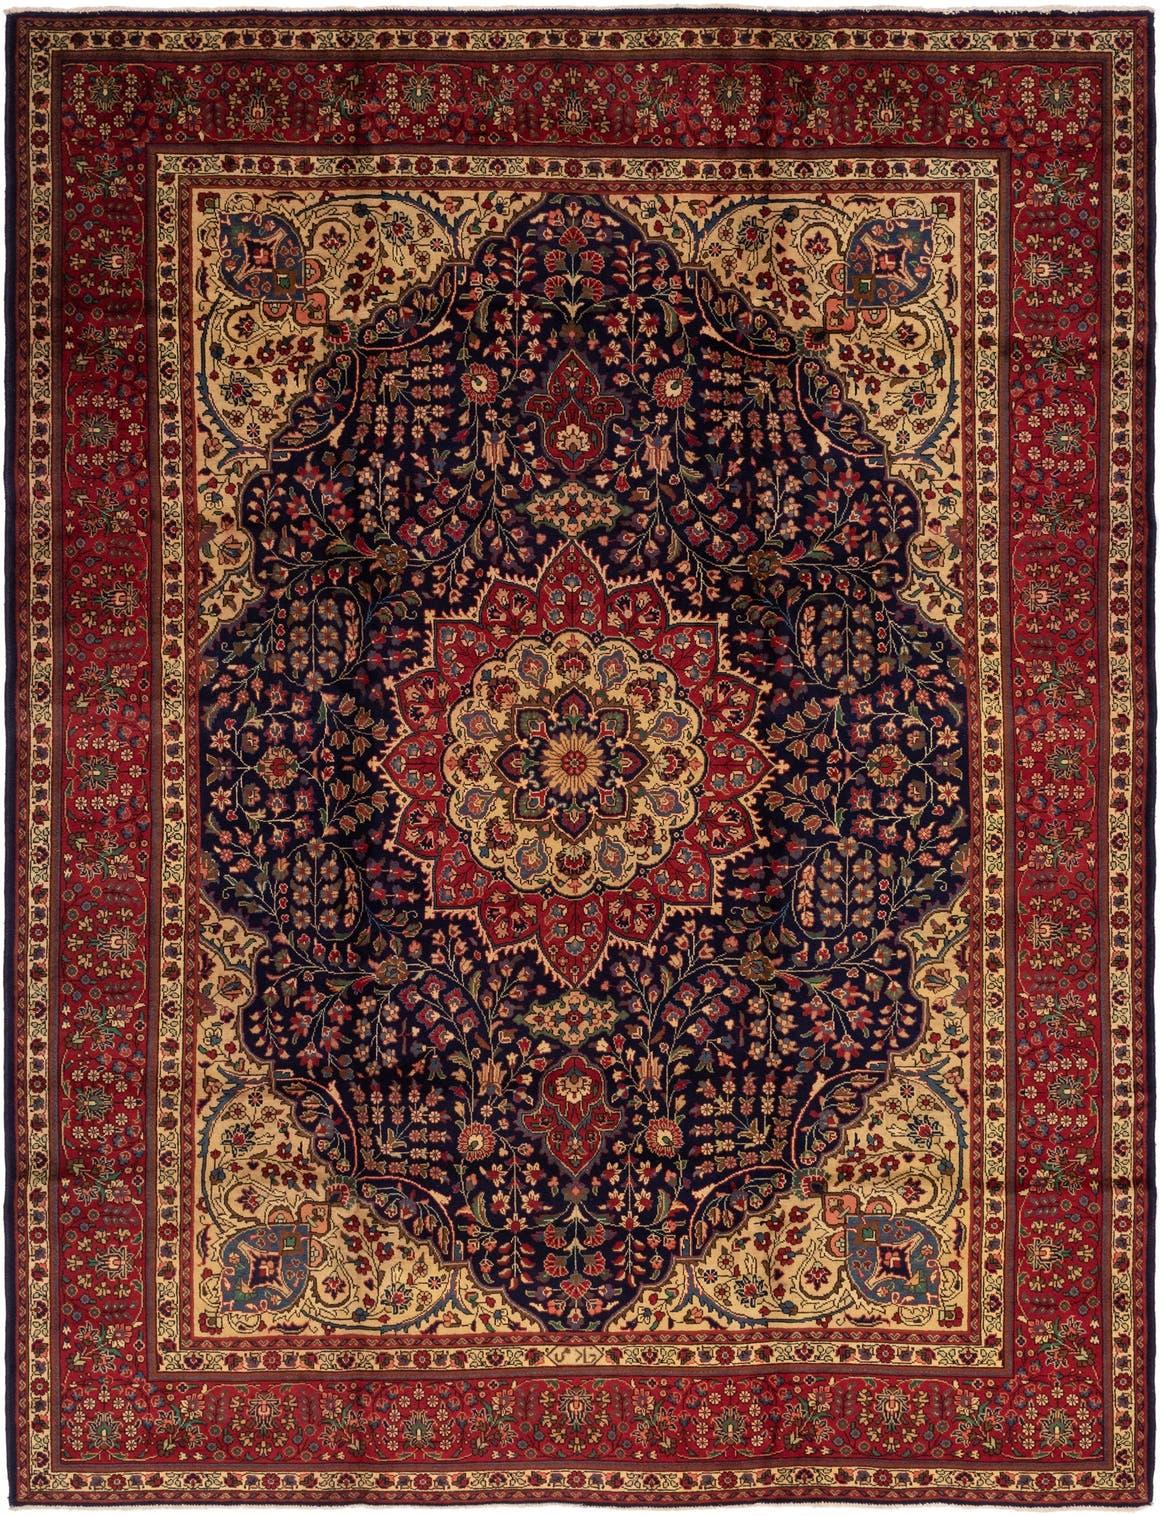 10' x 13' Tabriz Persian Rug main image